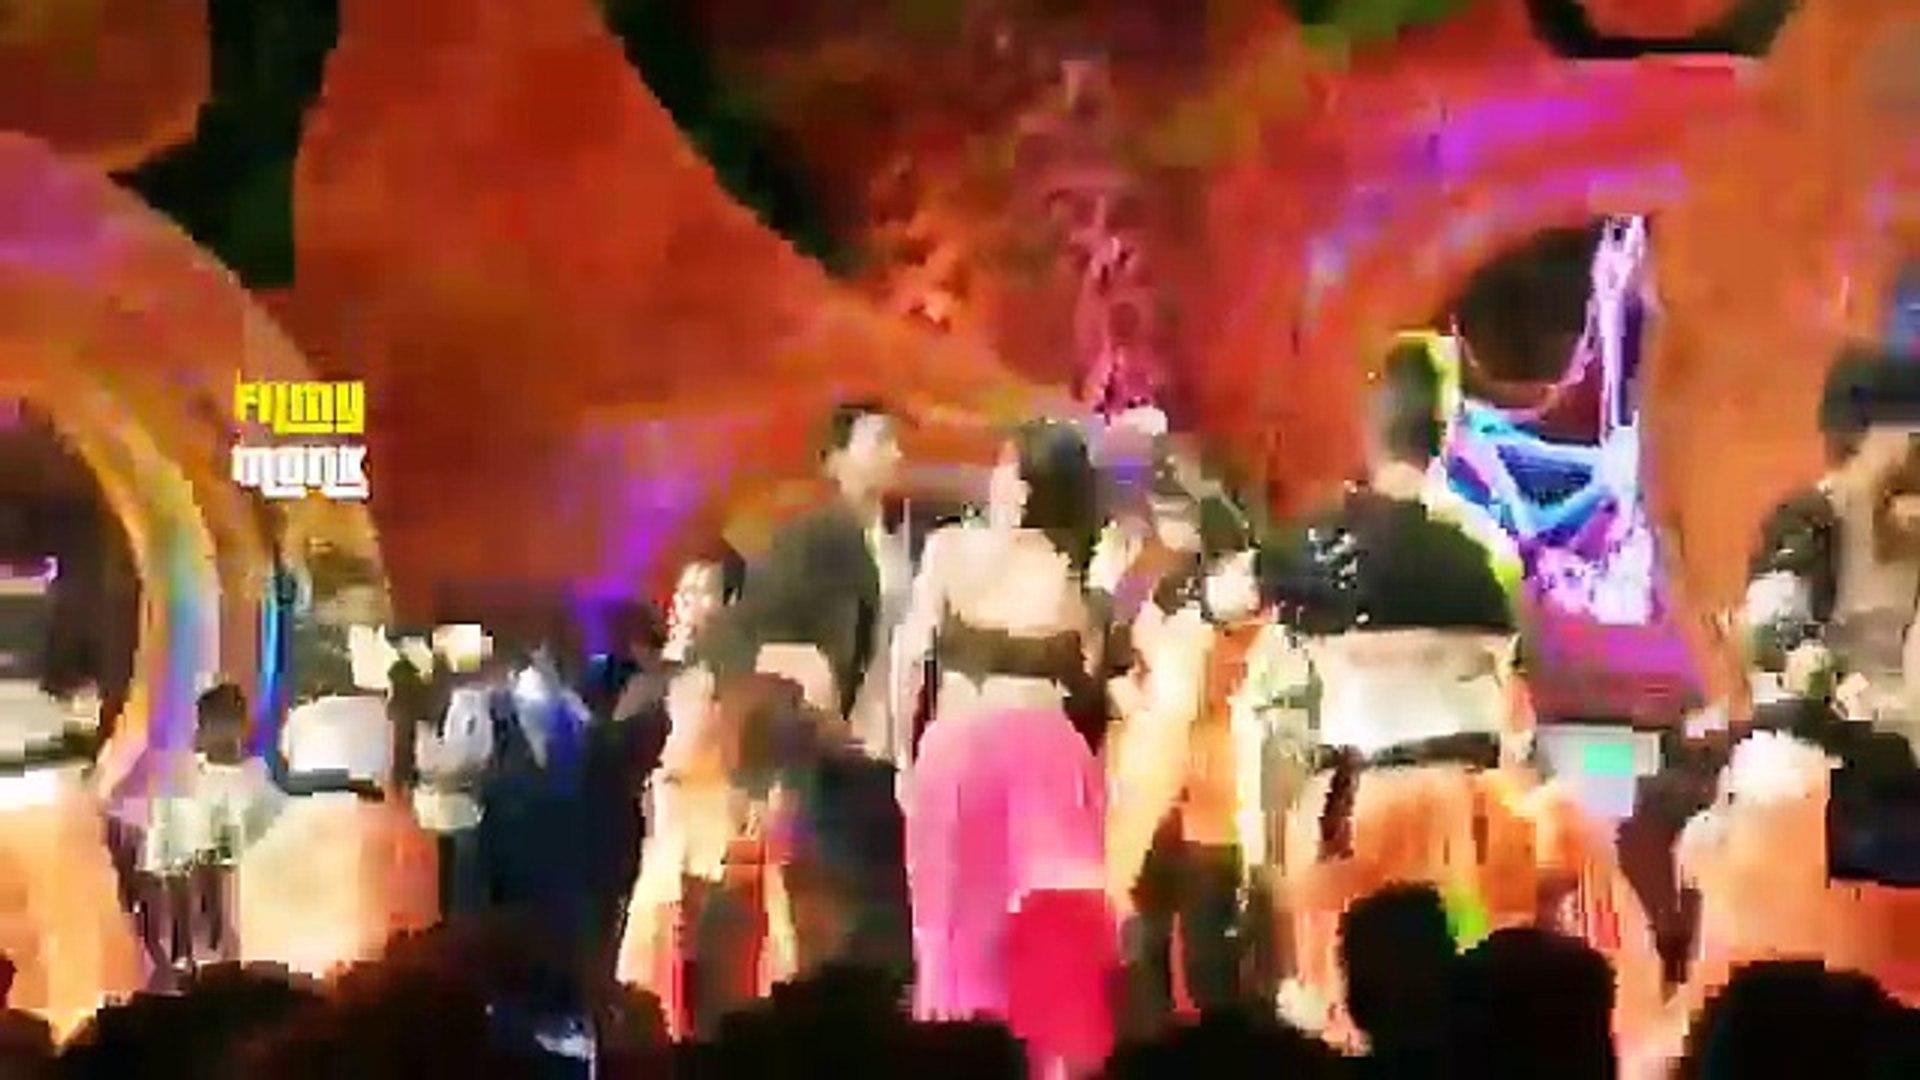 Rakul Preet Singh One Crore Paid Dance Performance For Gali Janardhan Daughter Wedding